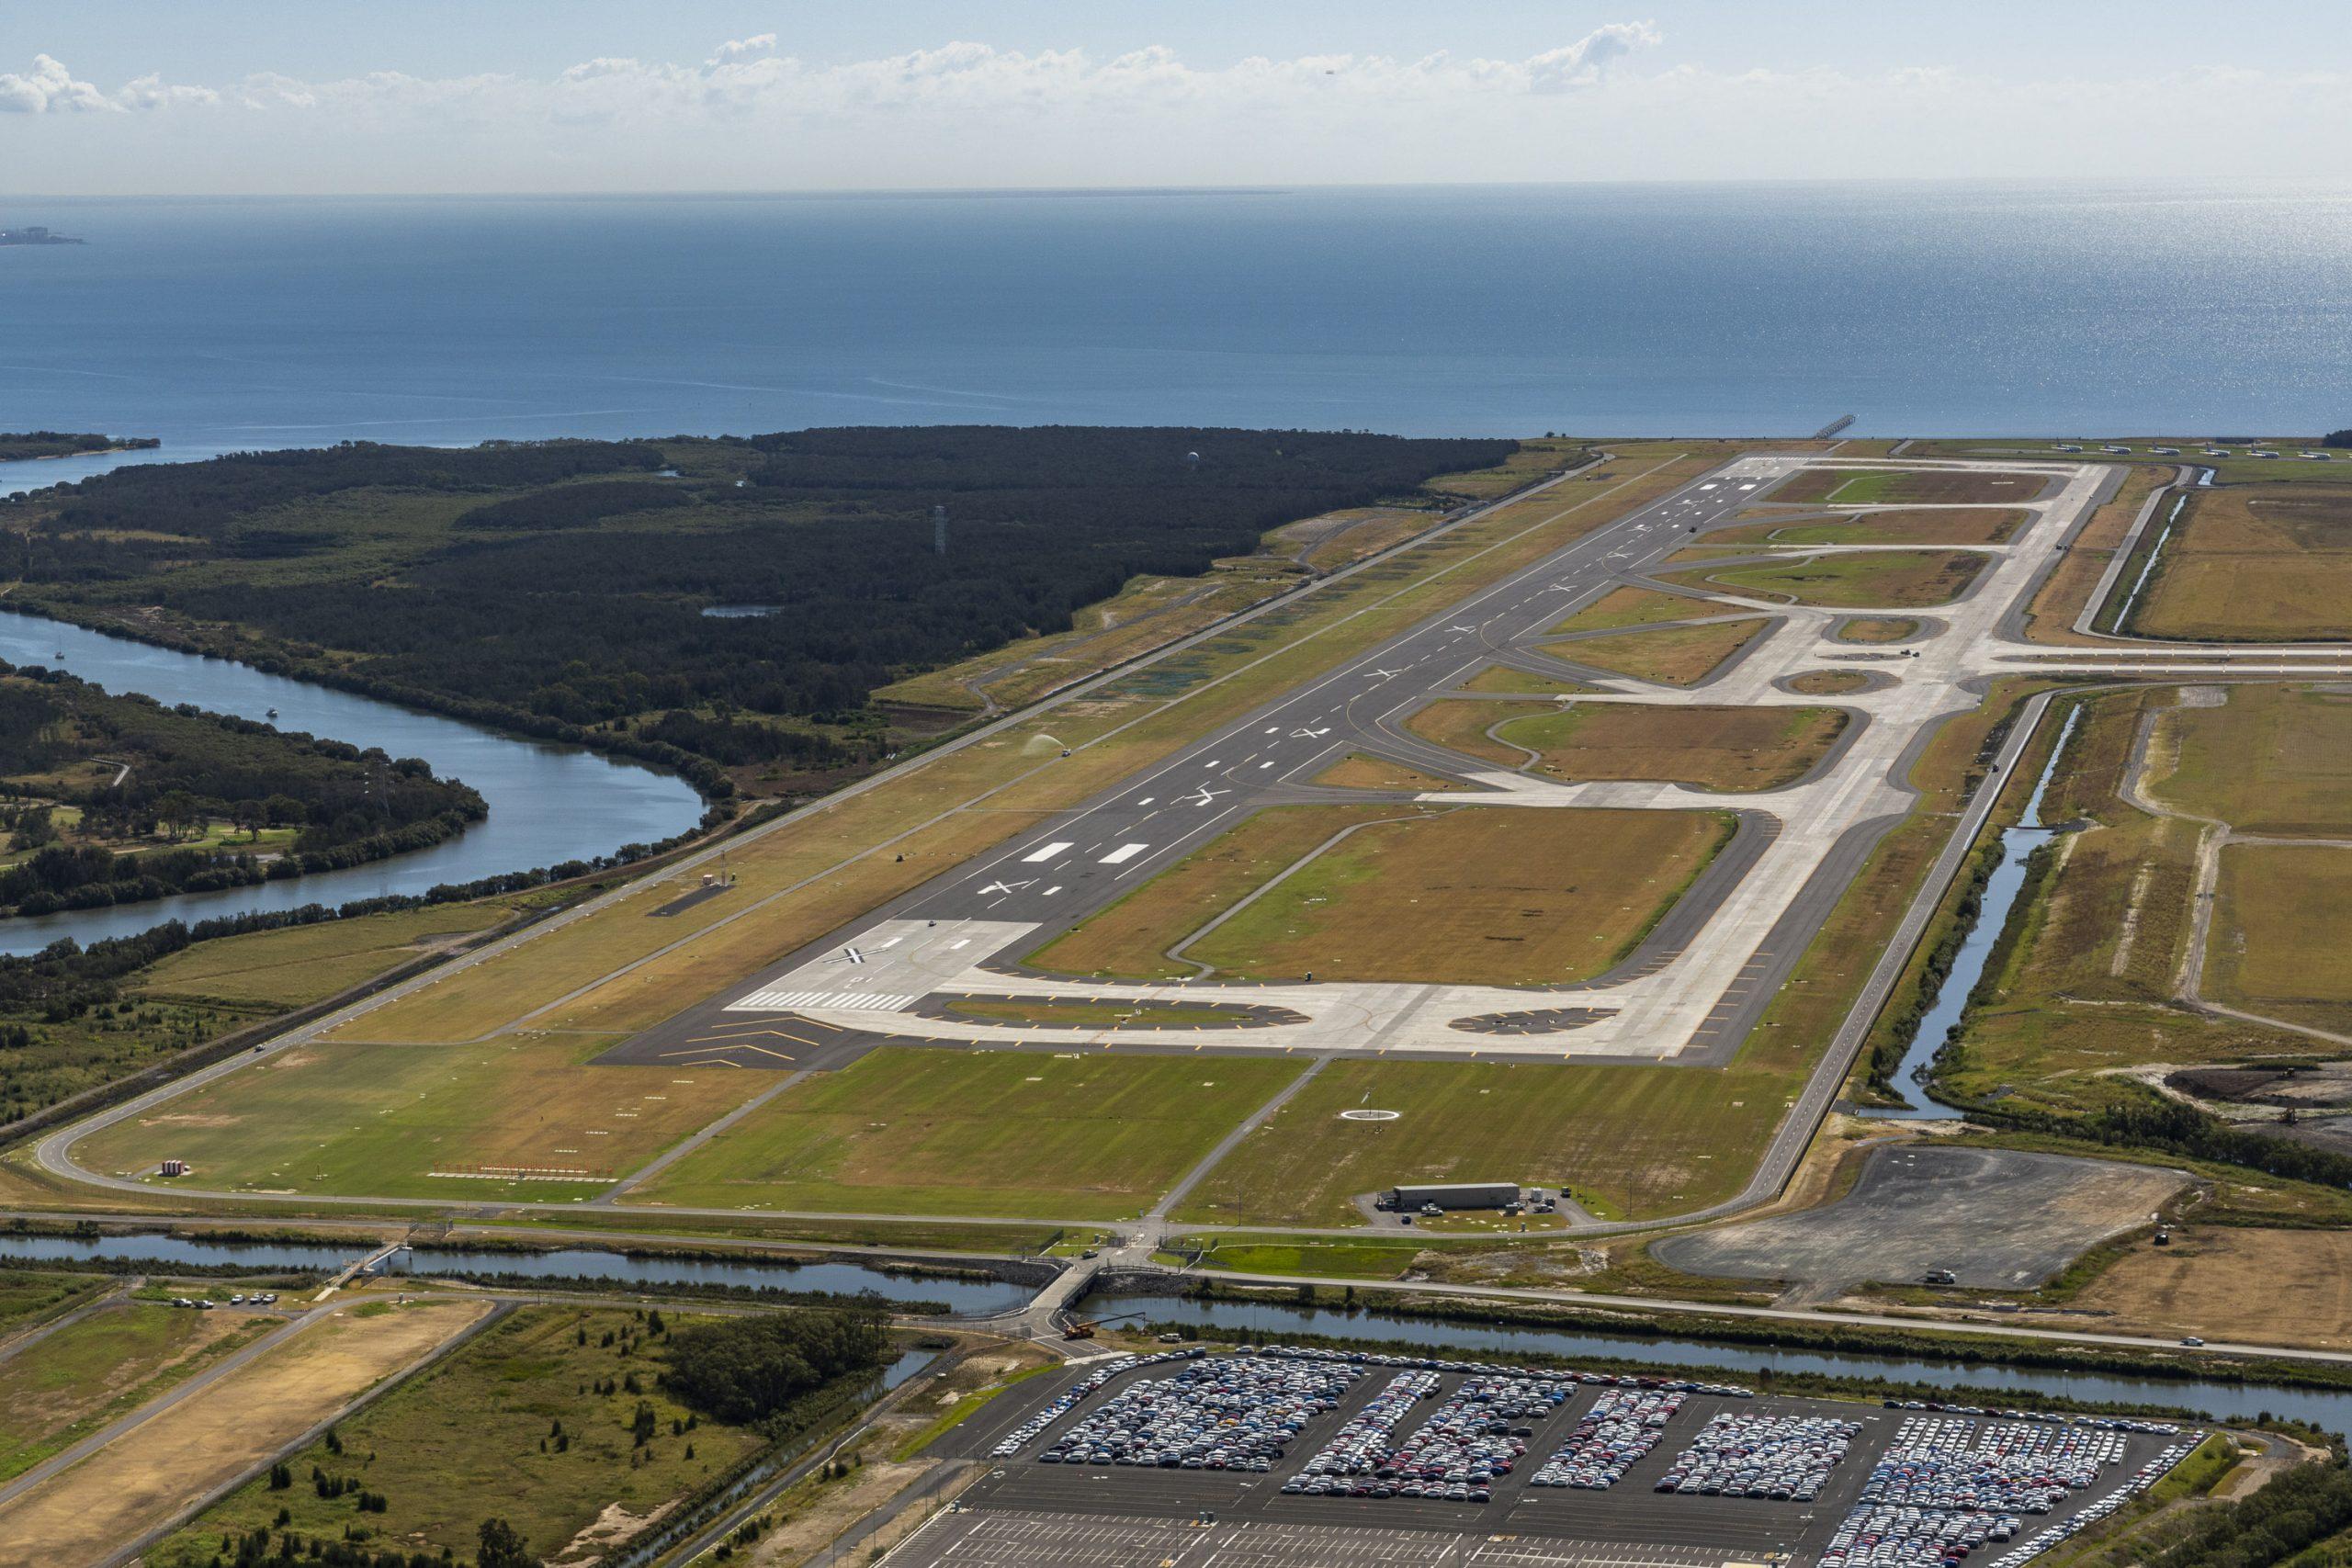 aerial image of the new Brisbane airport runway, April 2020